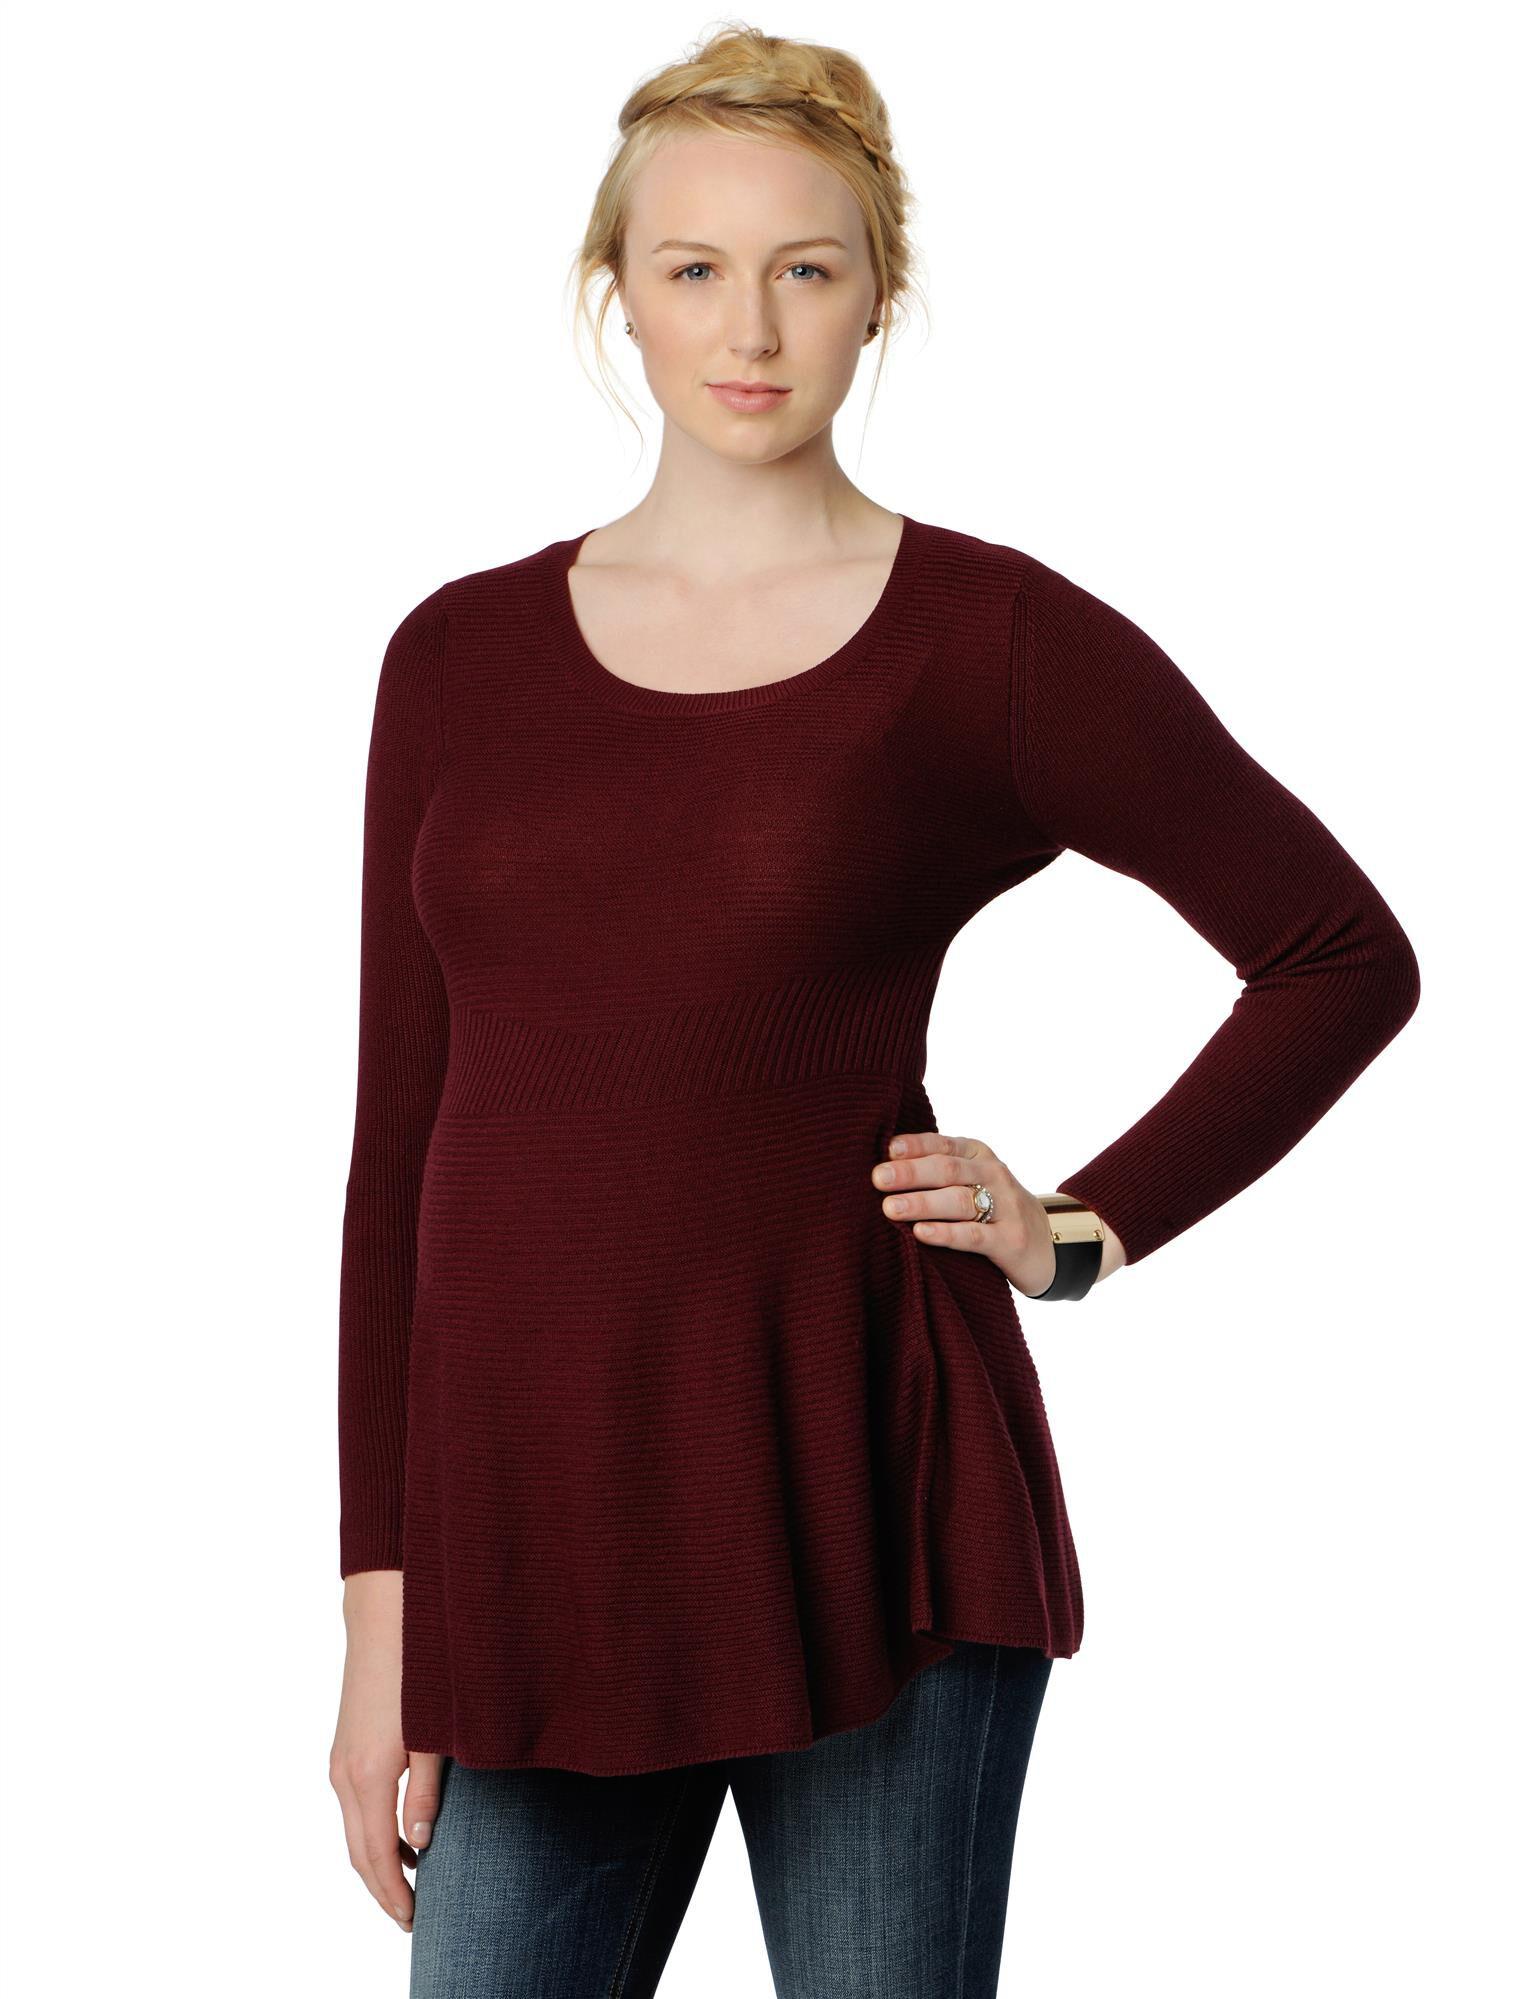 Peplum Maternity Sweater